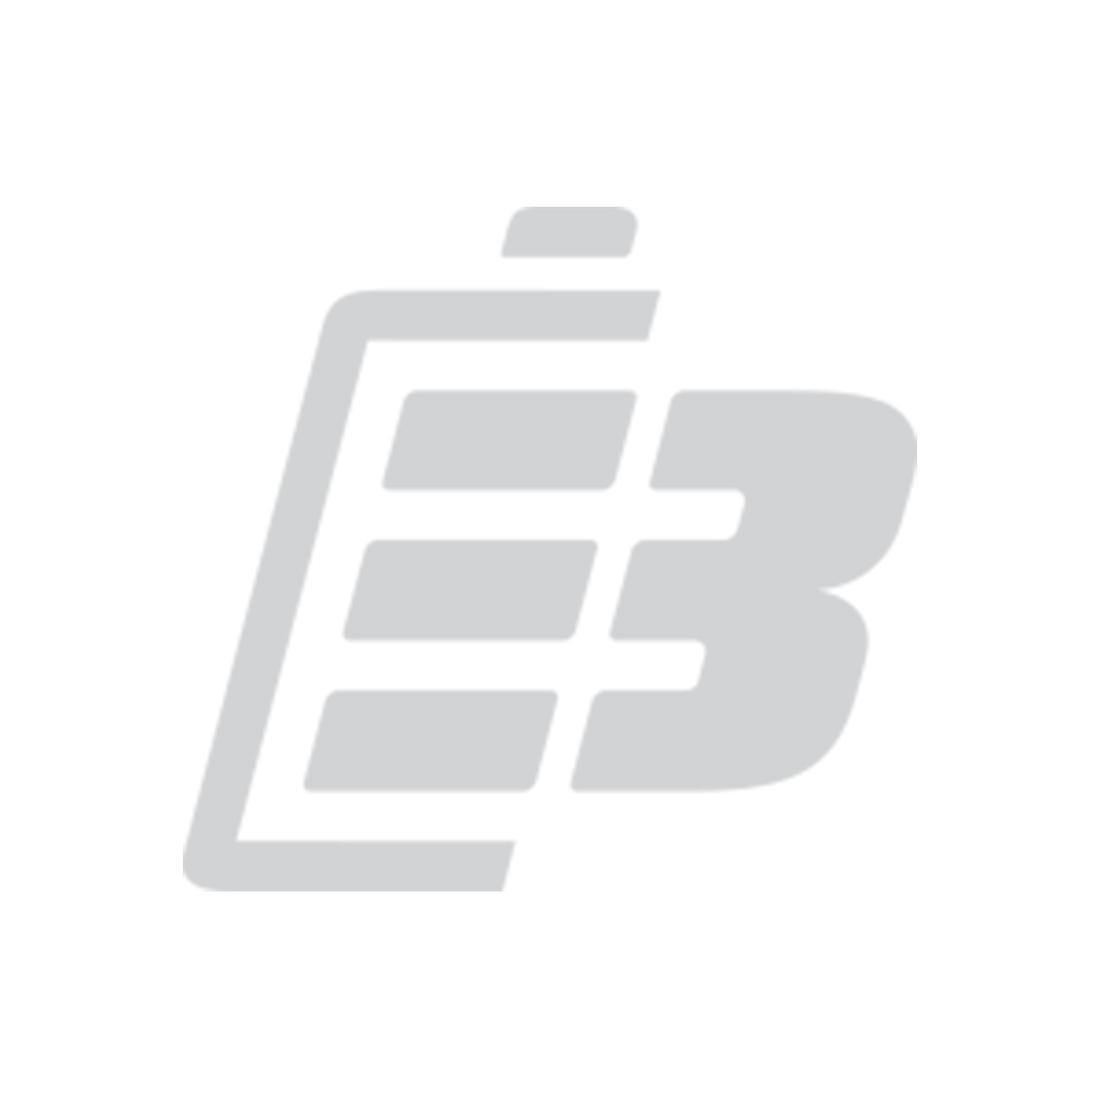 Smartphone battery Blackberry Q10_1